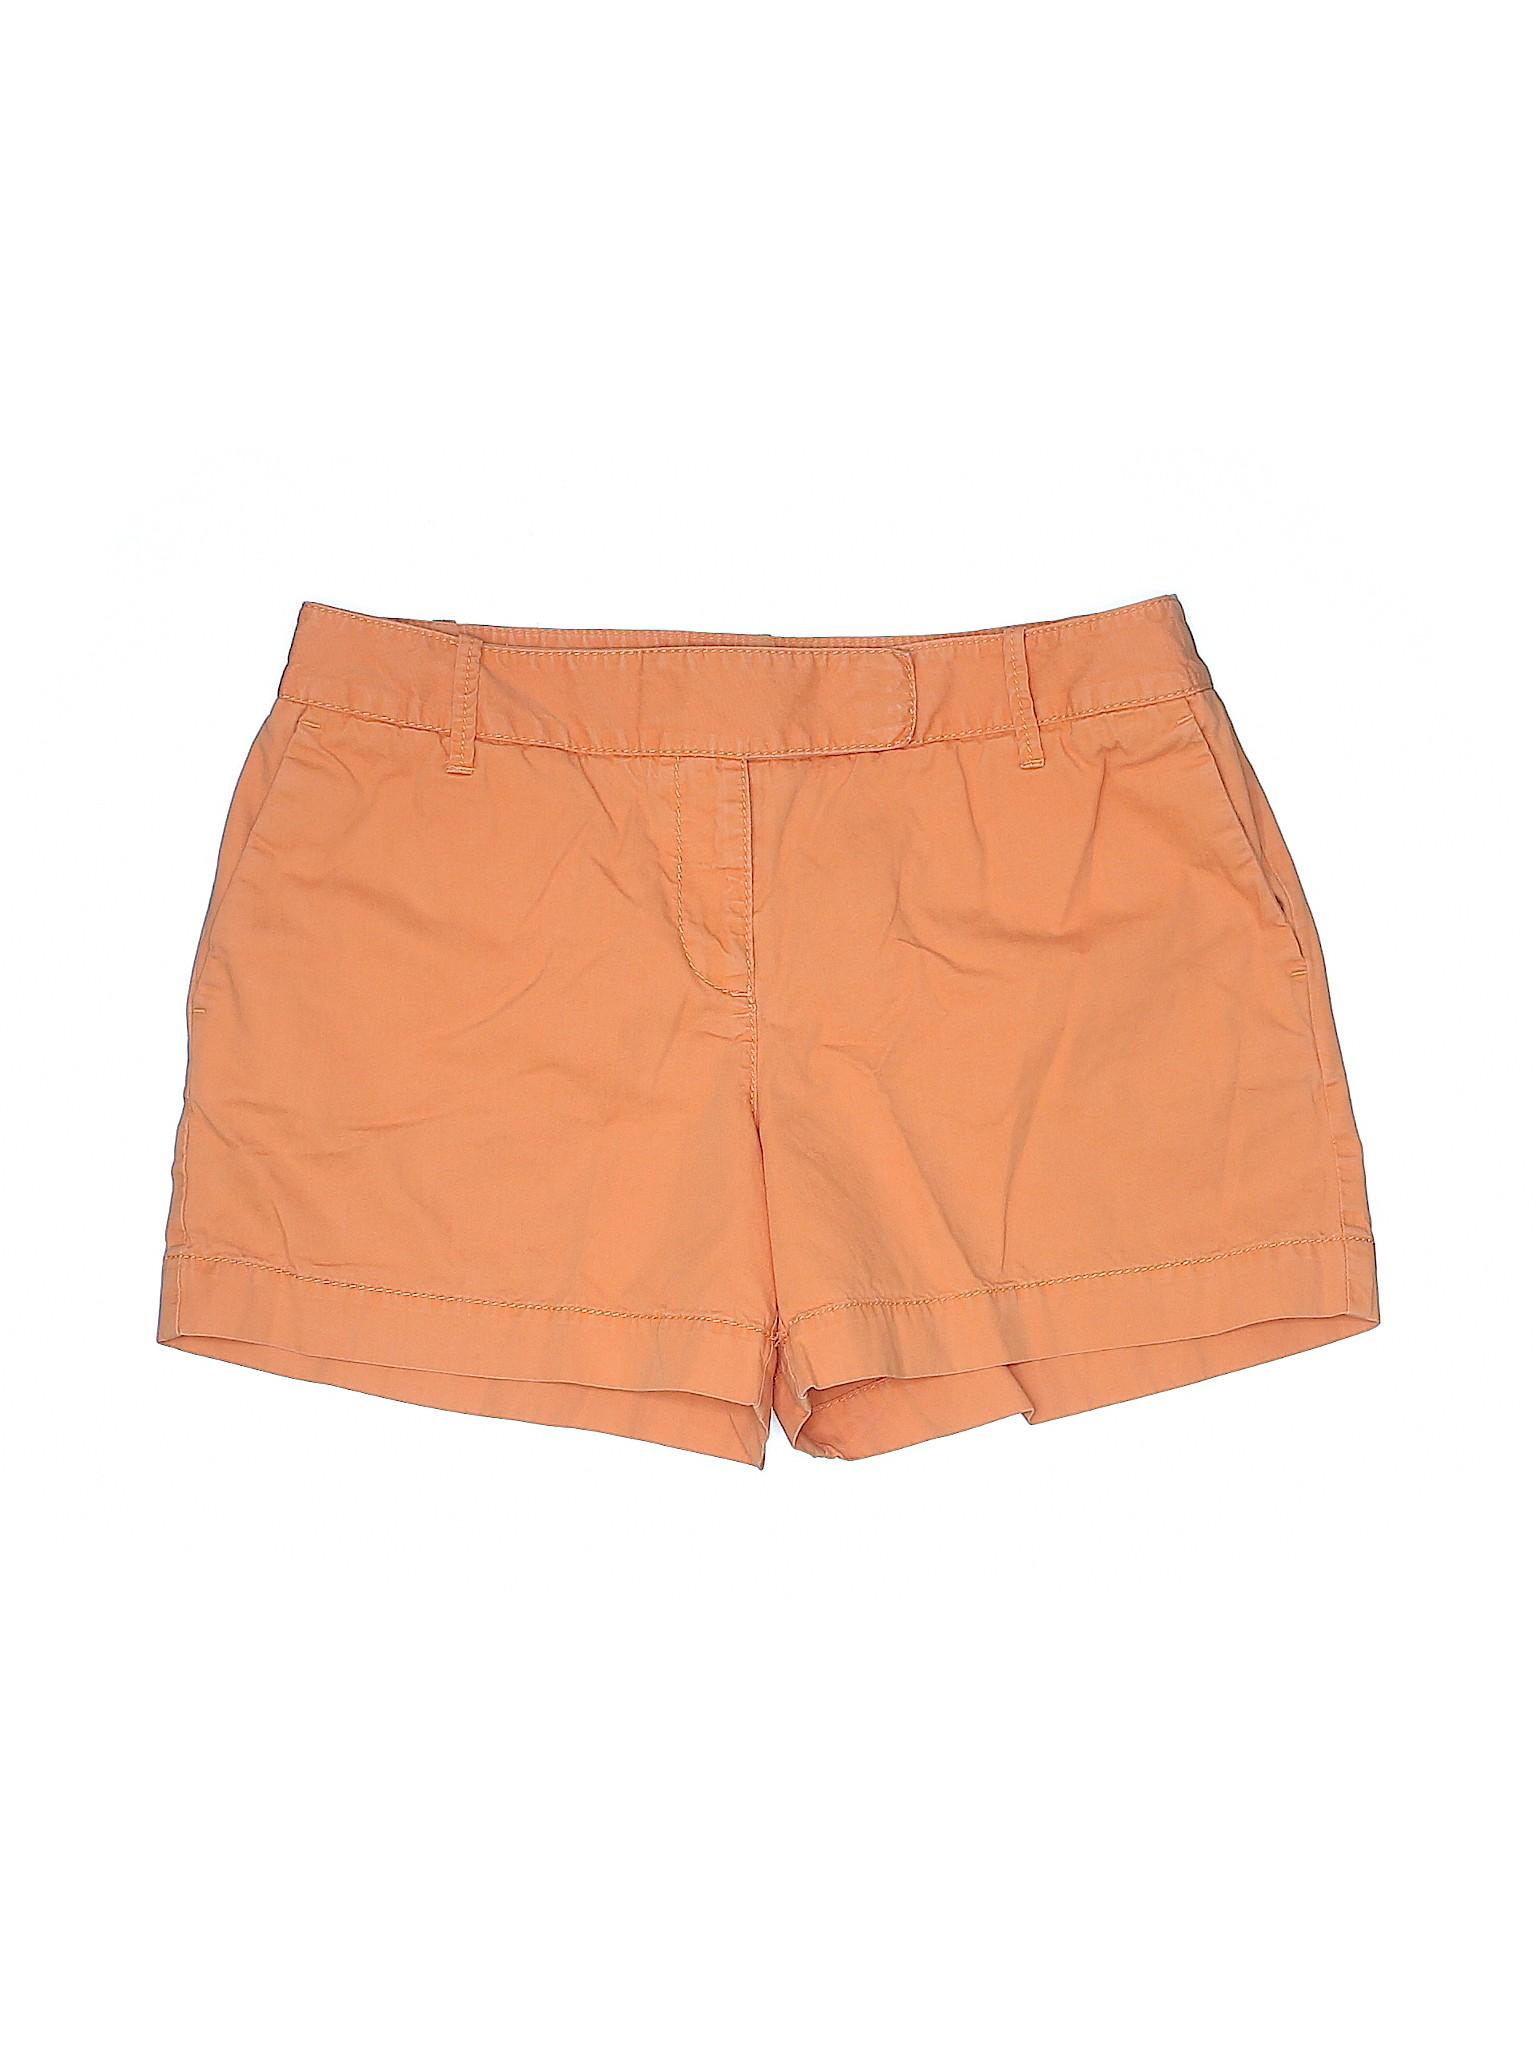 Loft Shorts Winter Boutique Khaki Taylor Ann Xgq6H